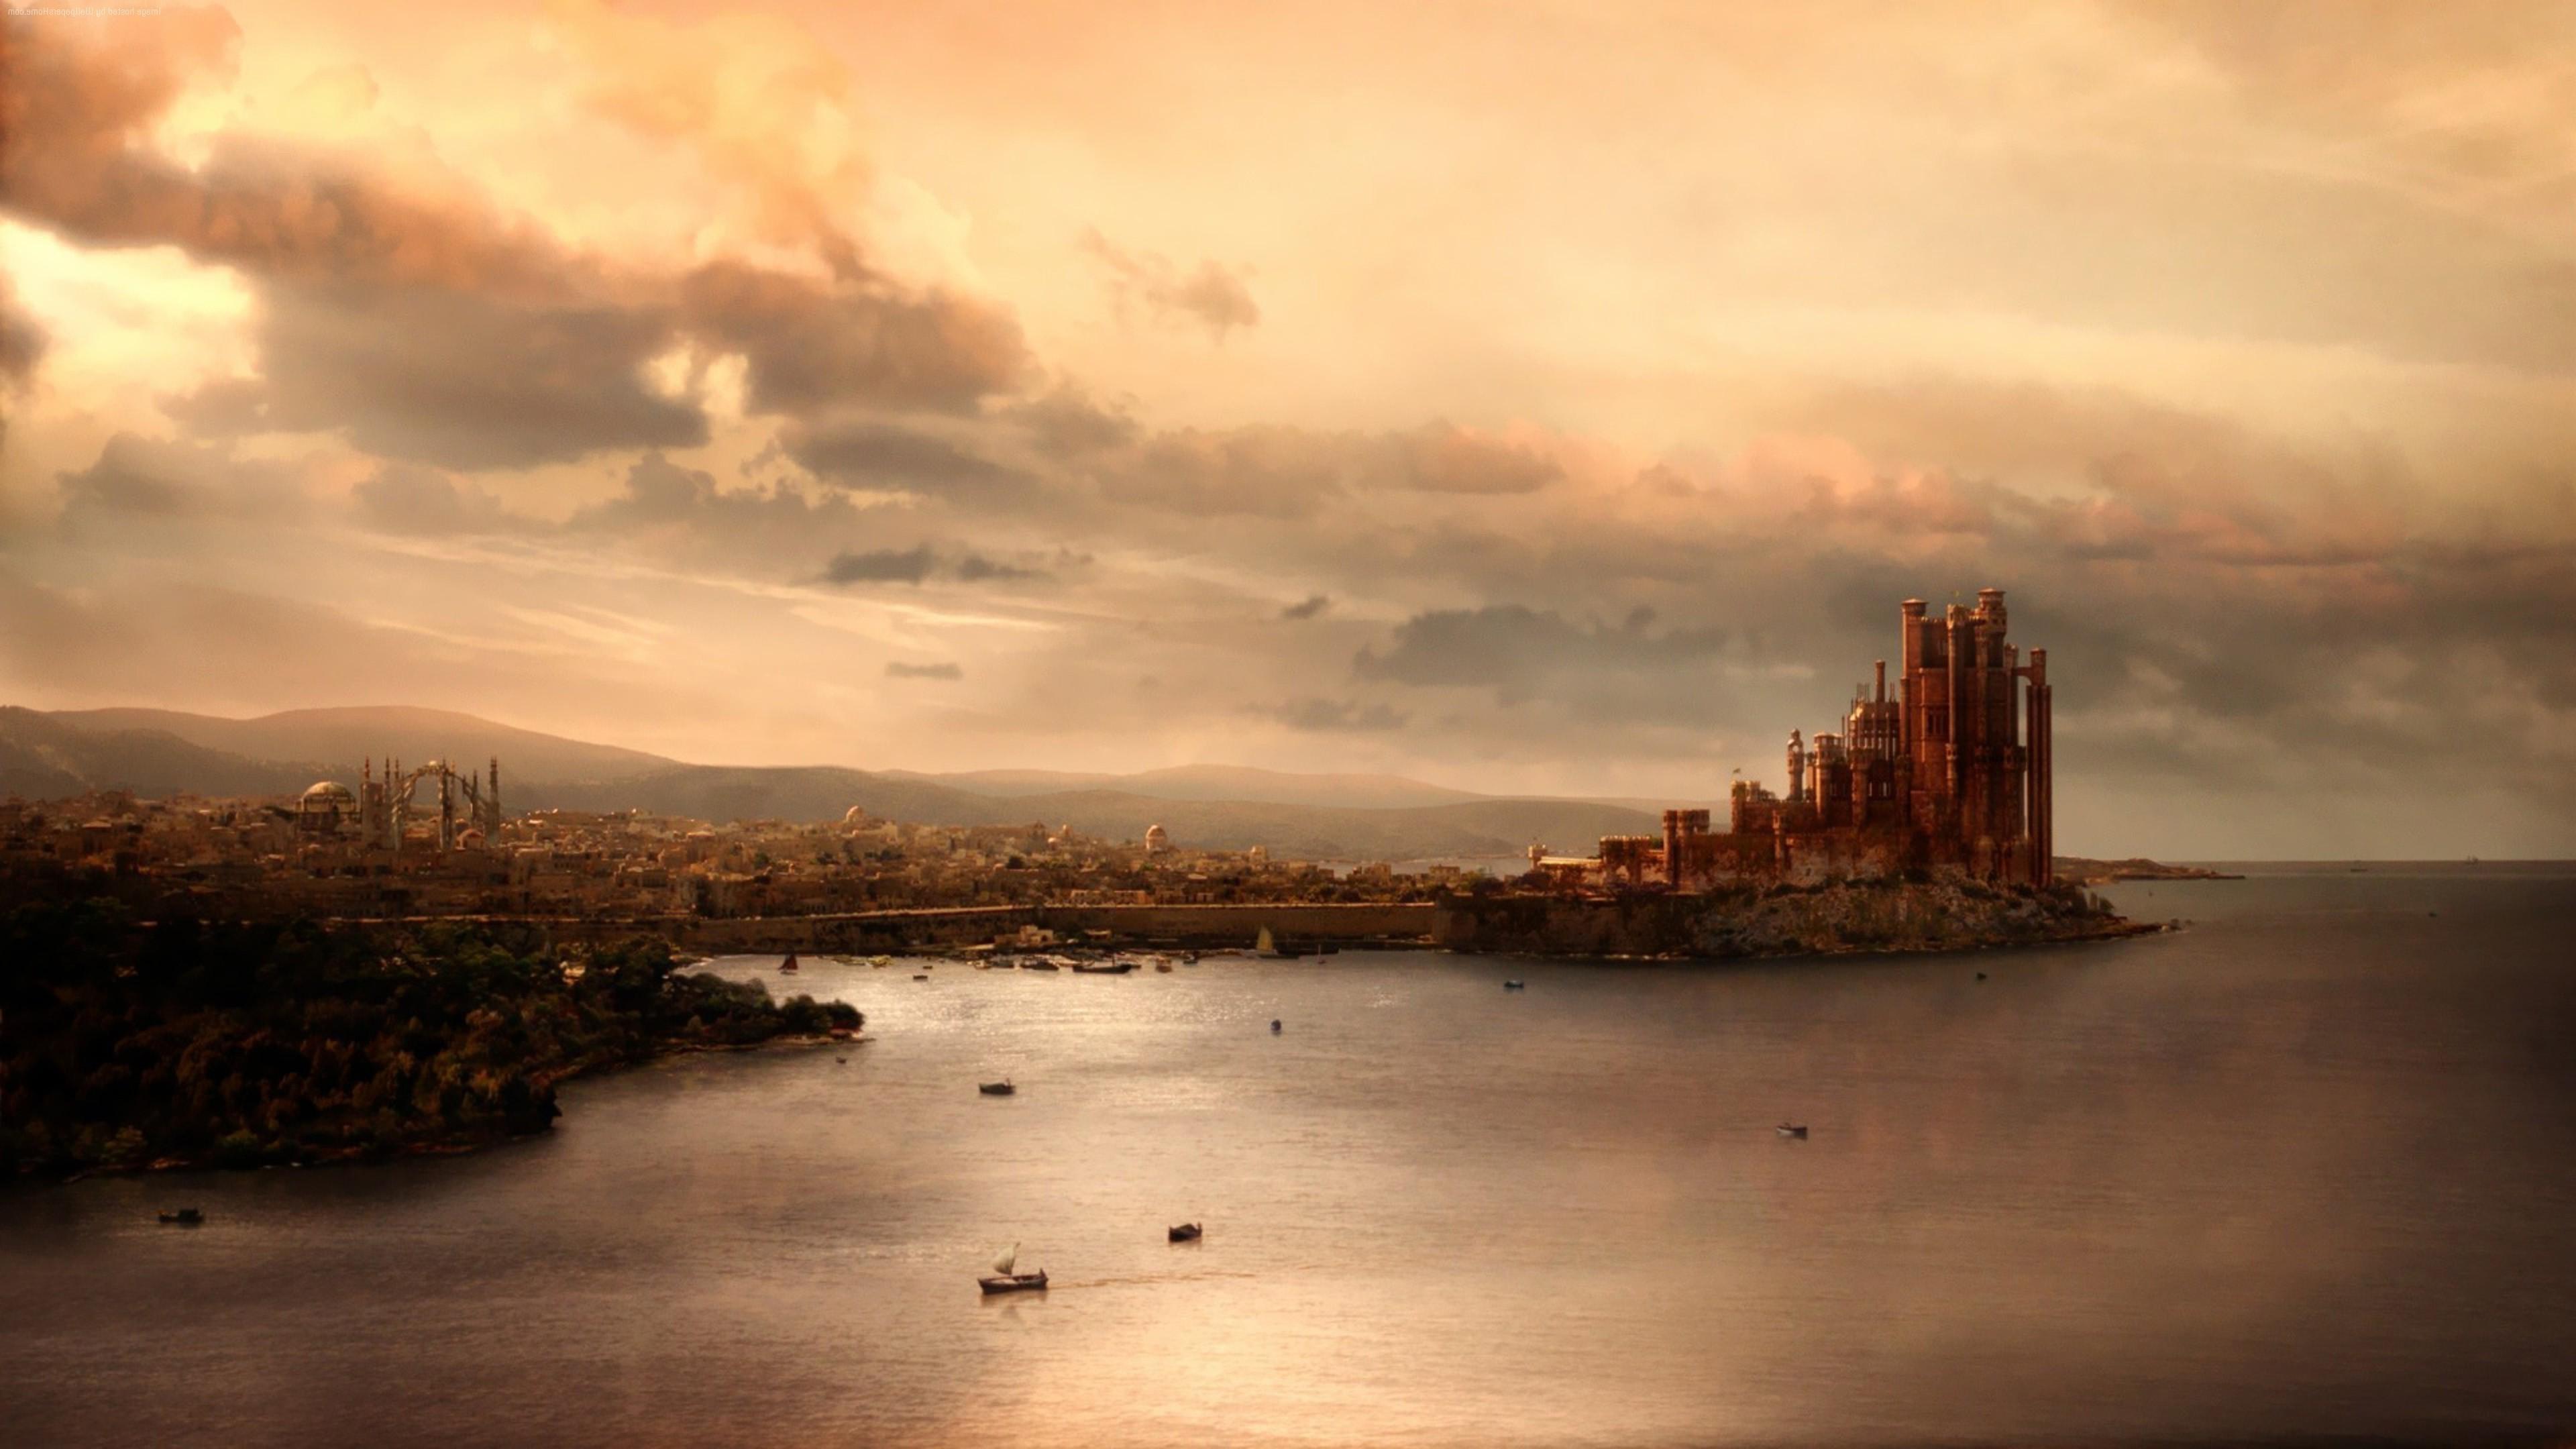 Game Of Thrones Landscape Wallpaper Hd - HD Wallpaper